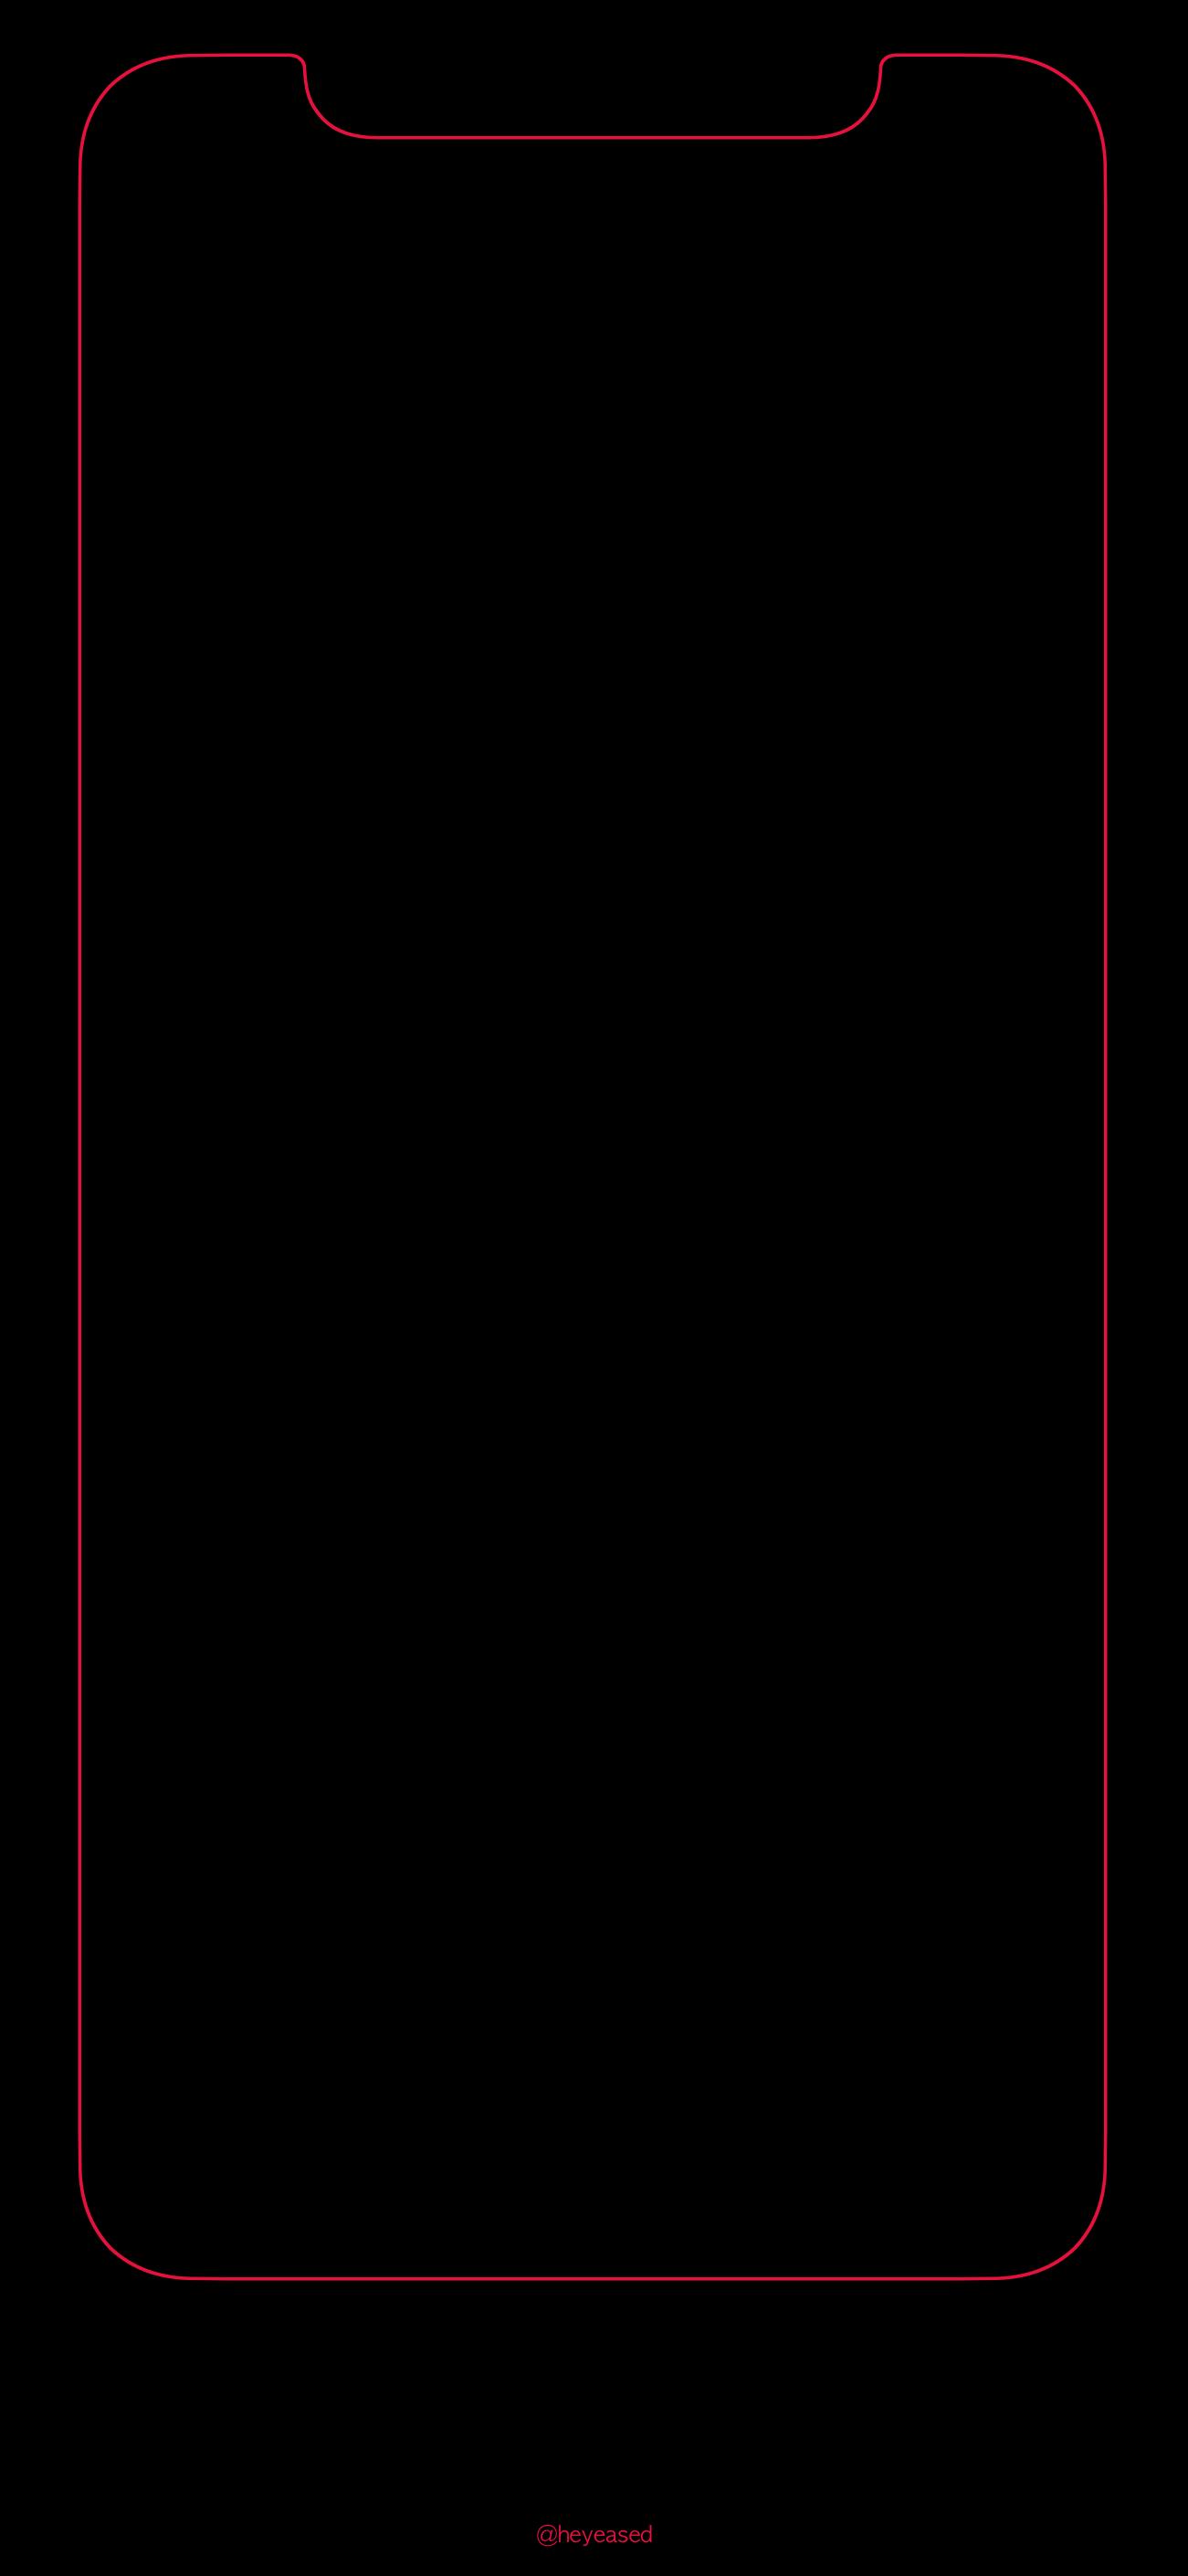 Iphone X Wallpaper Notch Fondos De Pantalla Para Iphone X Gratis Sencillos Y